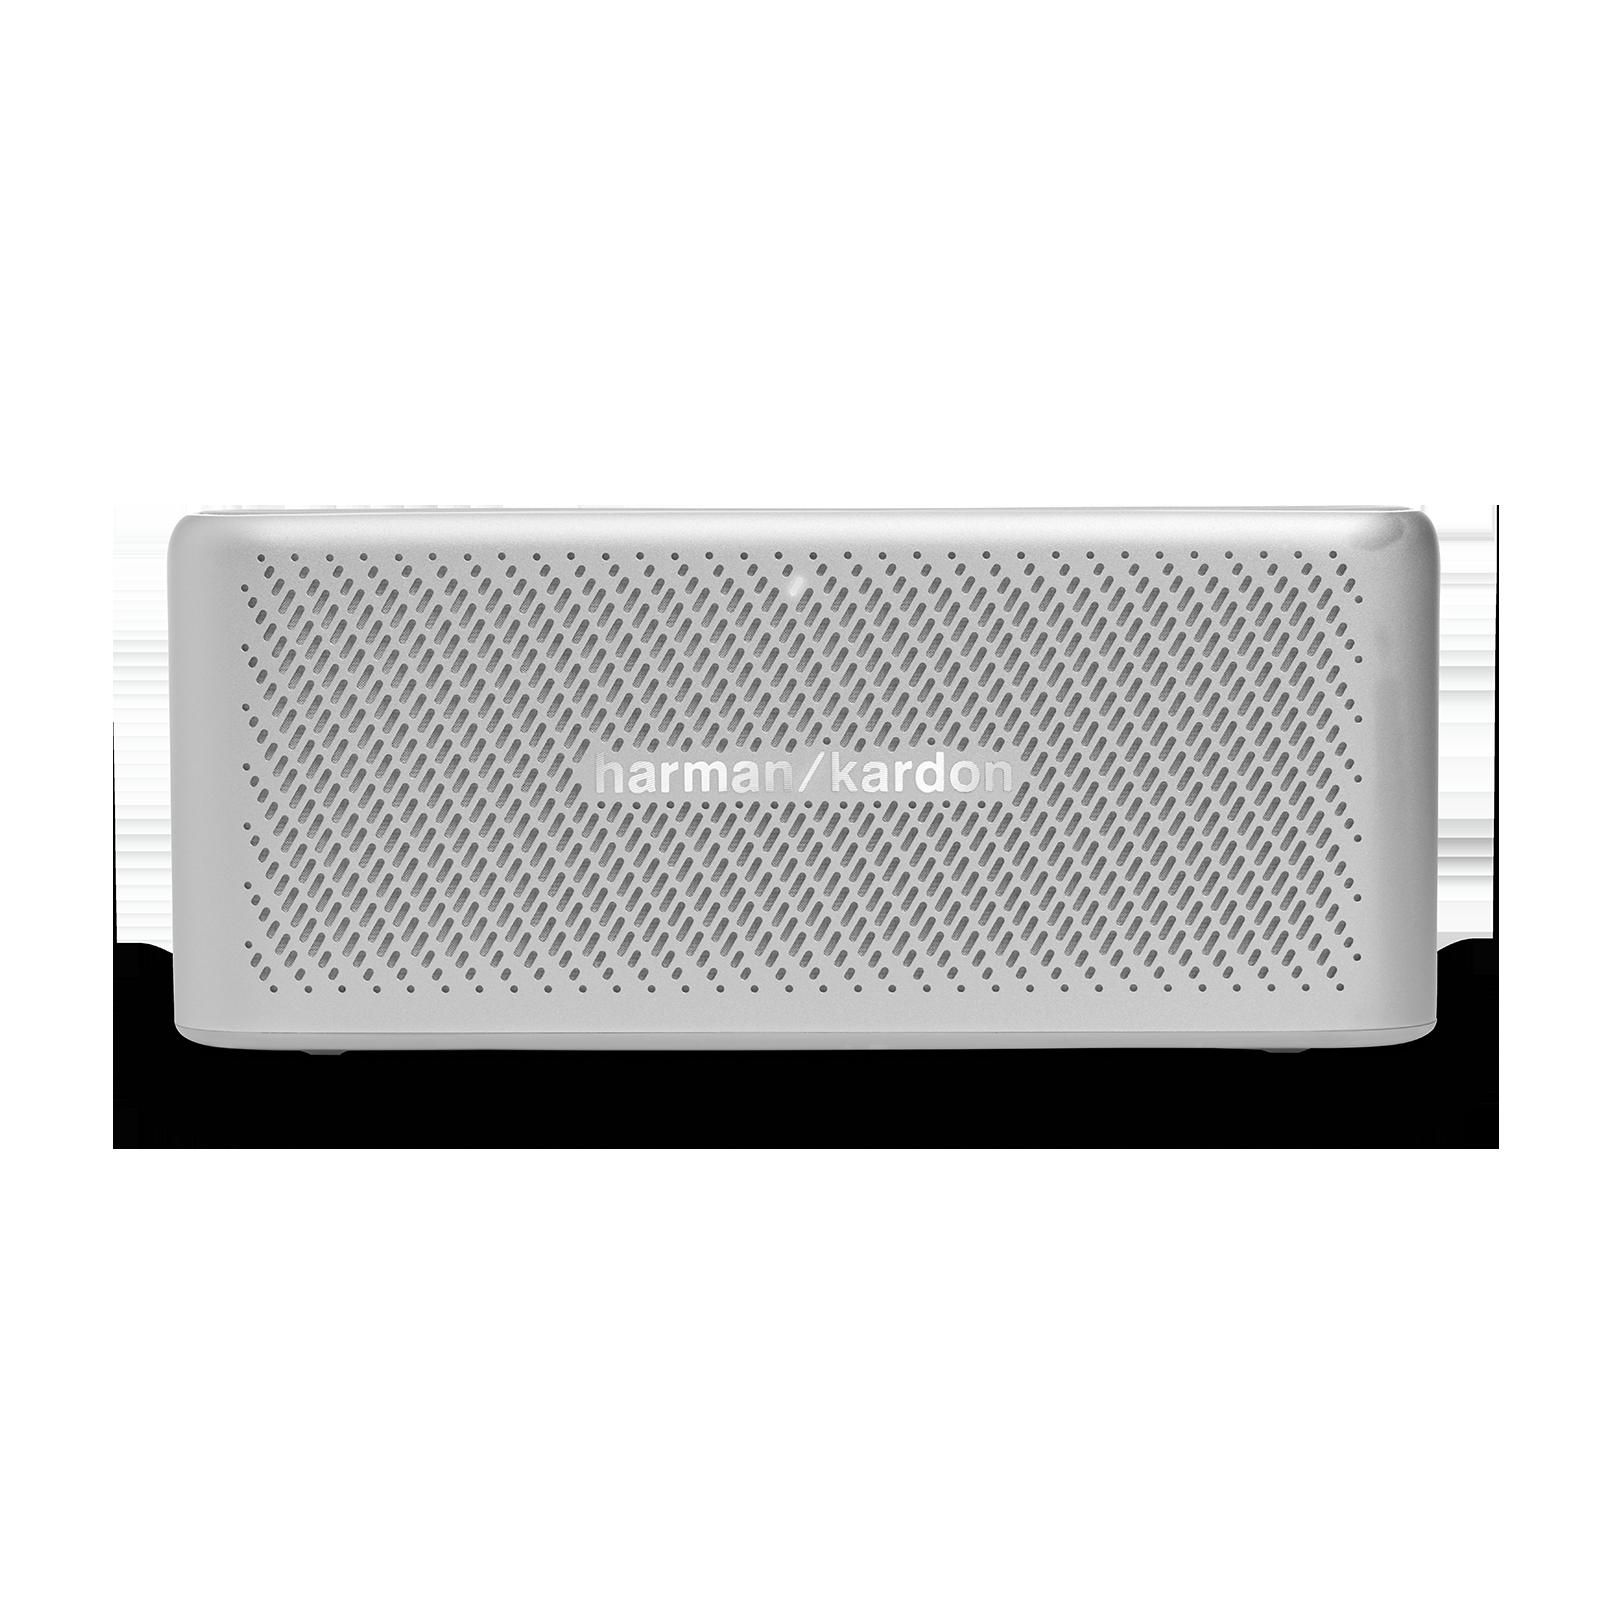 Traveler - Silver - All-in-one travel speaker - Front